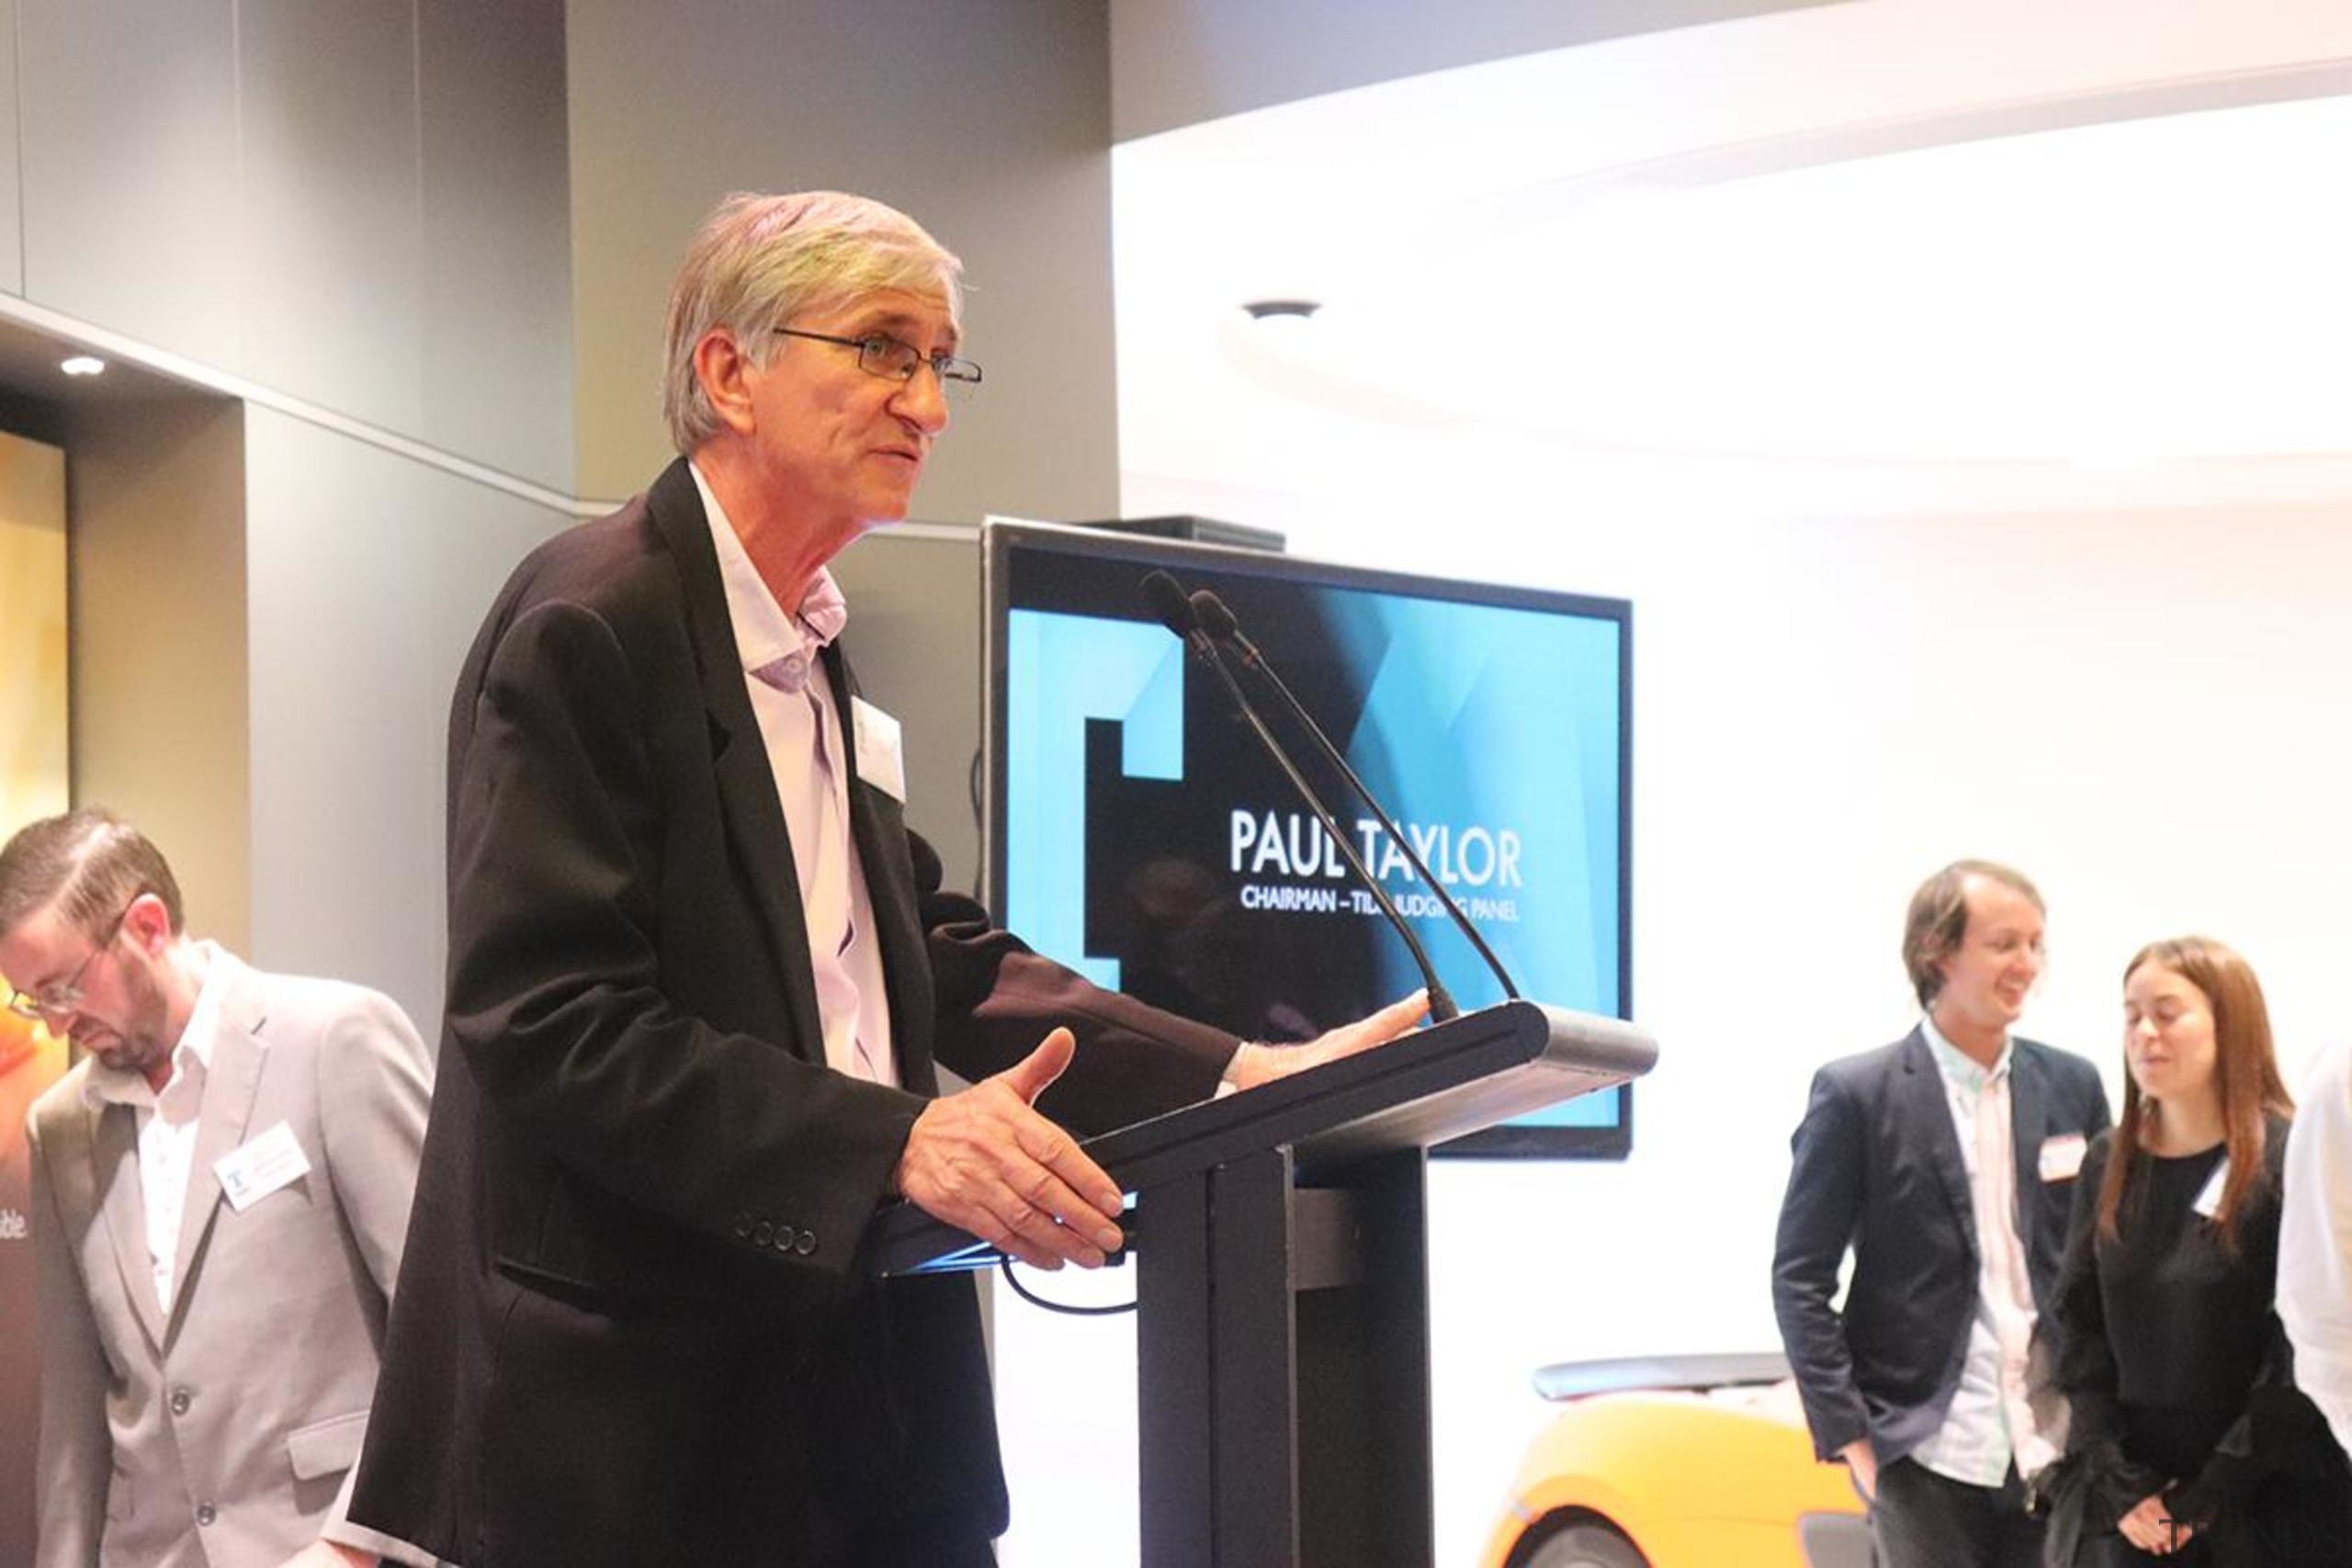 Paul Taylor - business | businessperson | collaboration business, businessperson, collaboration, employment, event, job, presentation, public speaking, technology, white